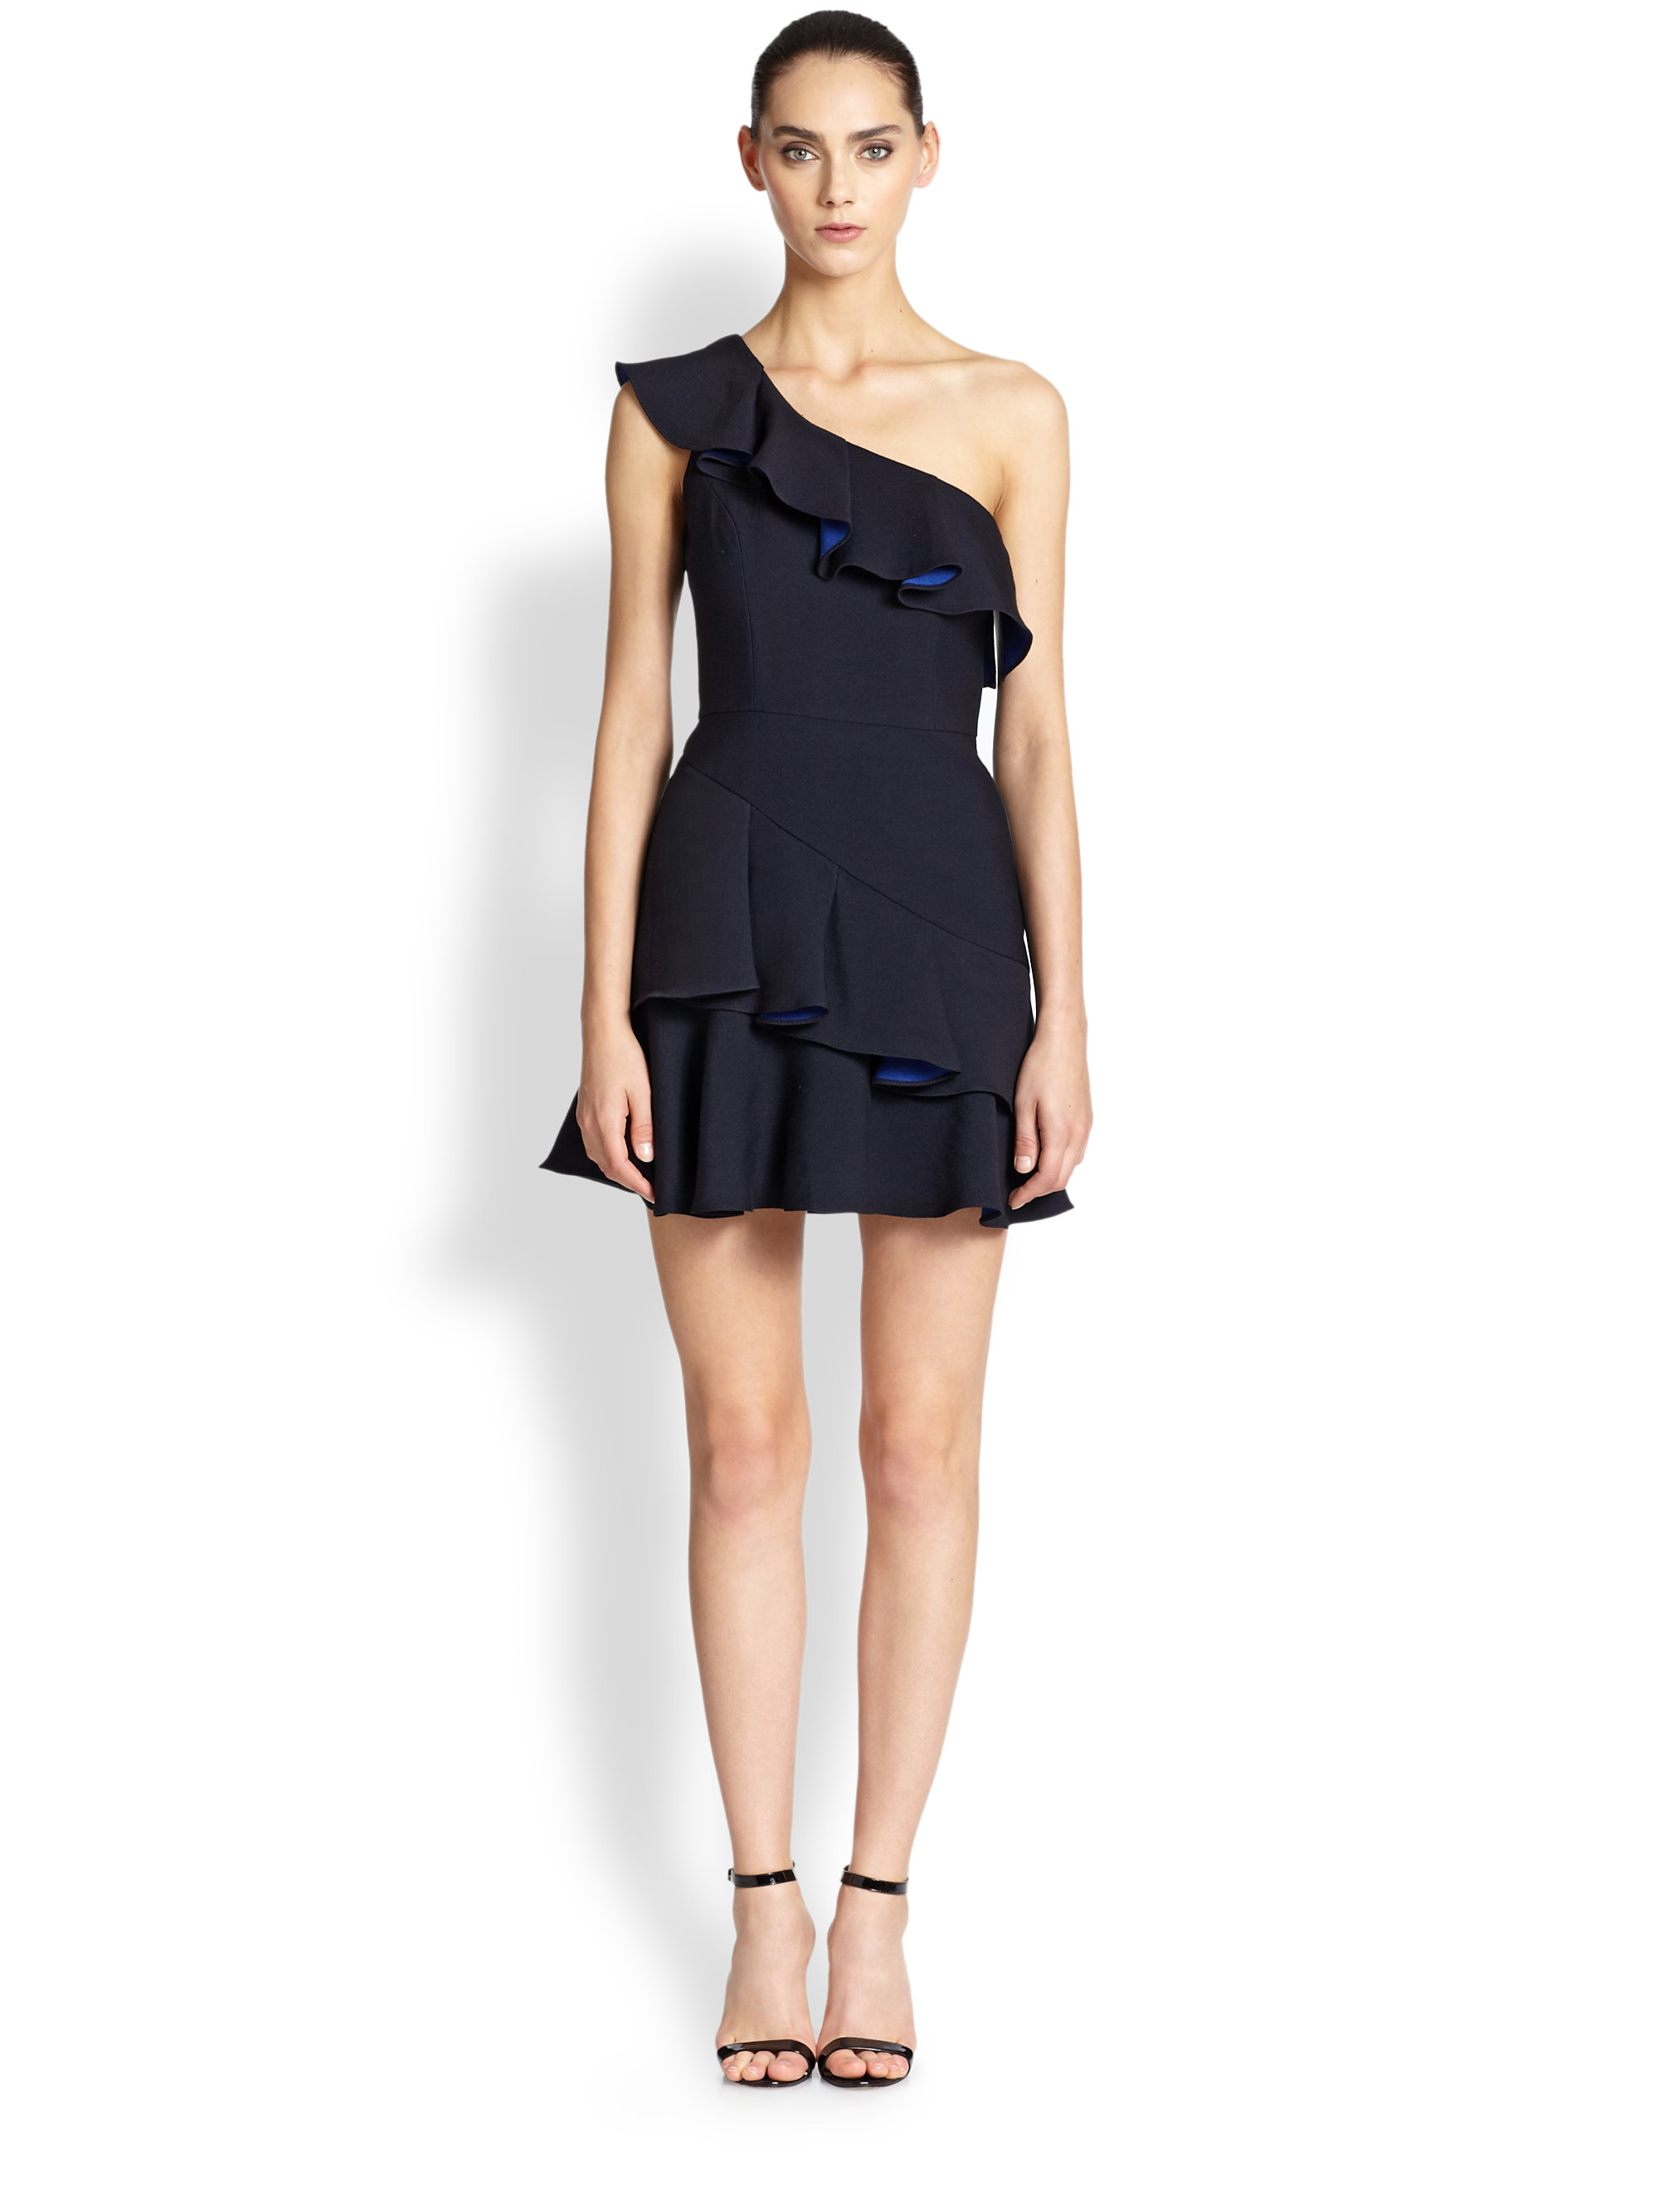 8437b34d9f0 BCBGMAXAZRIA One-Shoulder Ruffle Dress in Black - Lyst